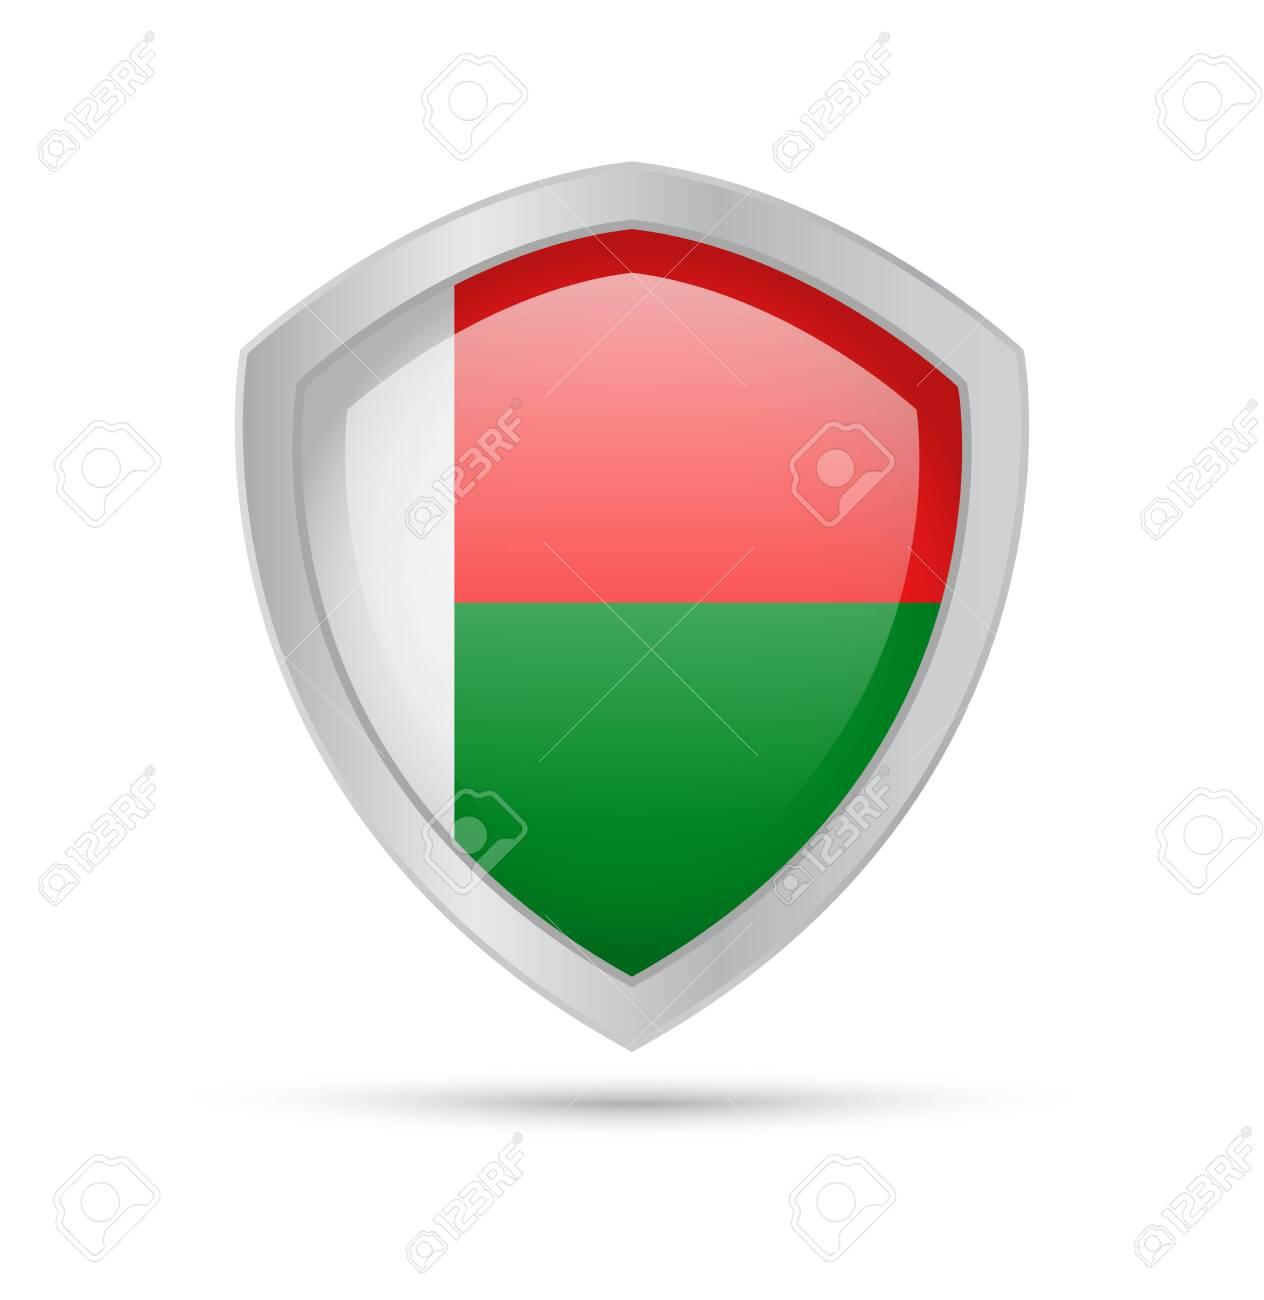 Shield with Madagascar flag on white background. Vector illustration. - 122126555